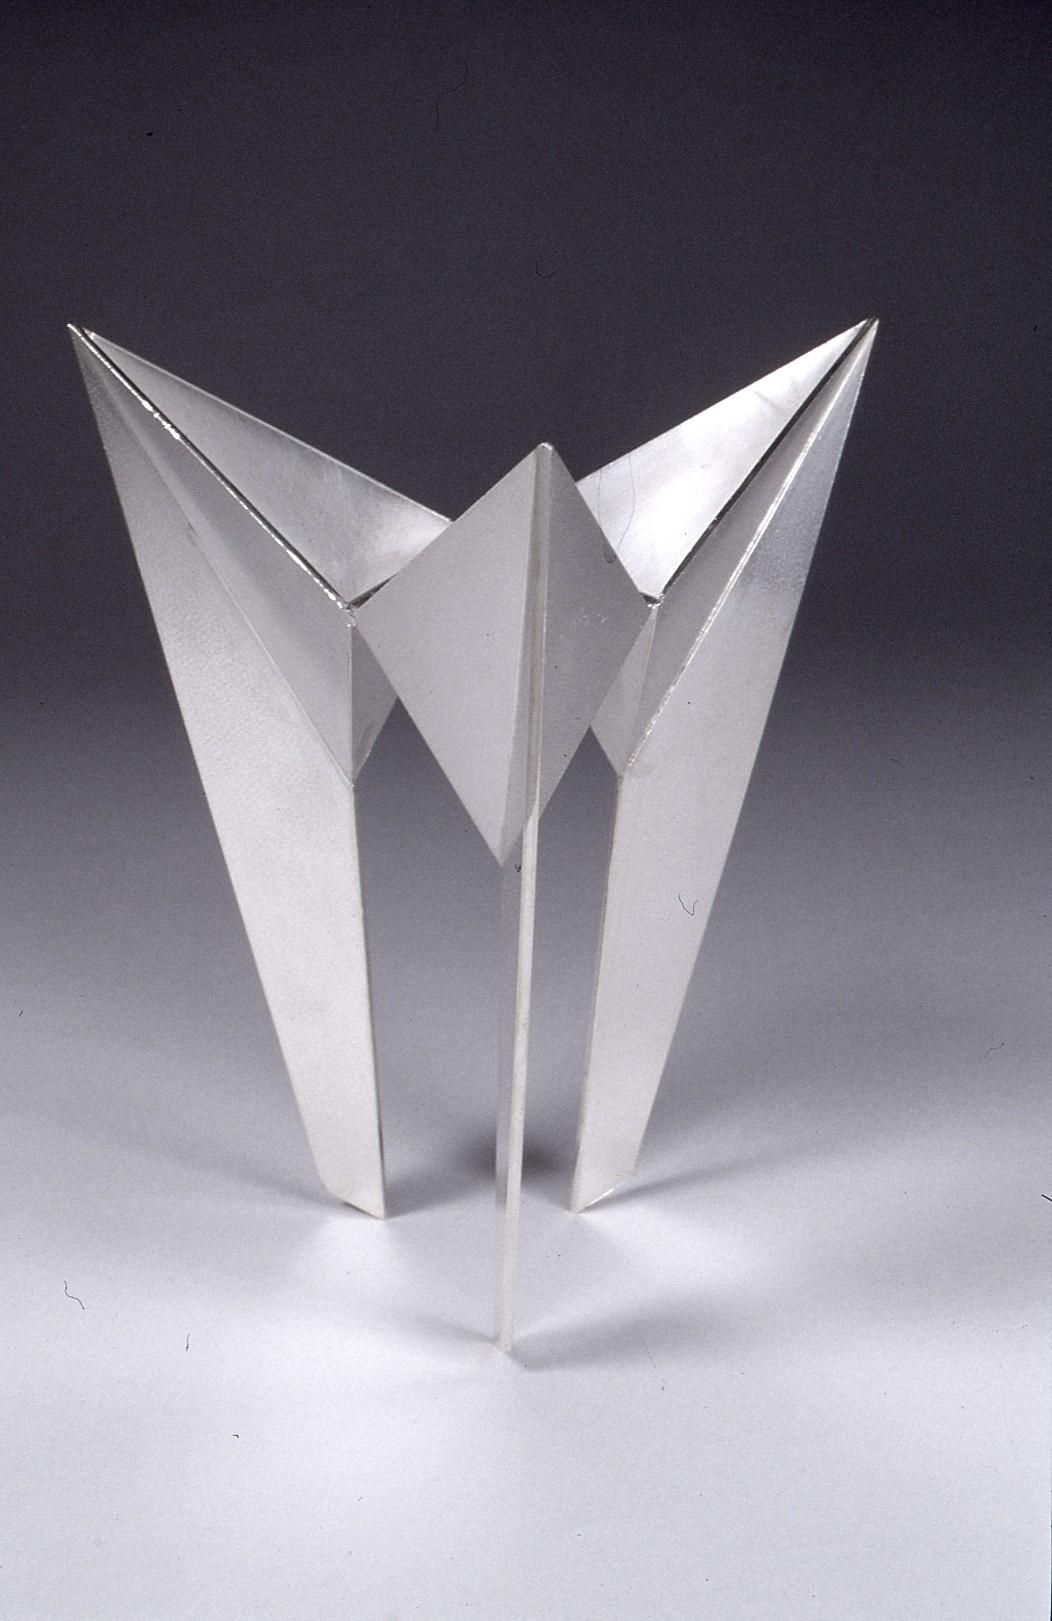 Star-Trek-Pyramid-Box-open-Sergey-Jivetin-born-in-Uzbekistan-sterling-silver1